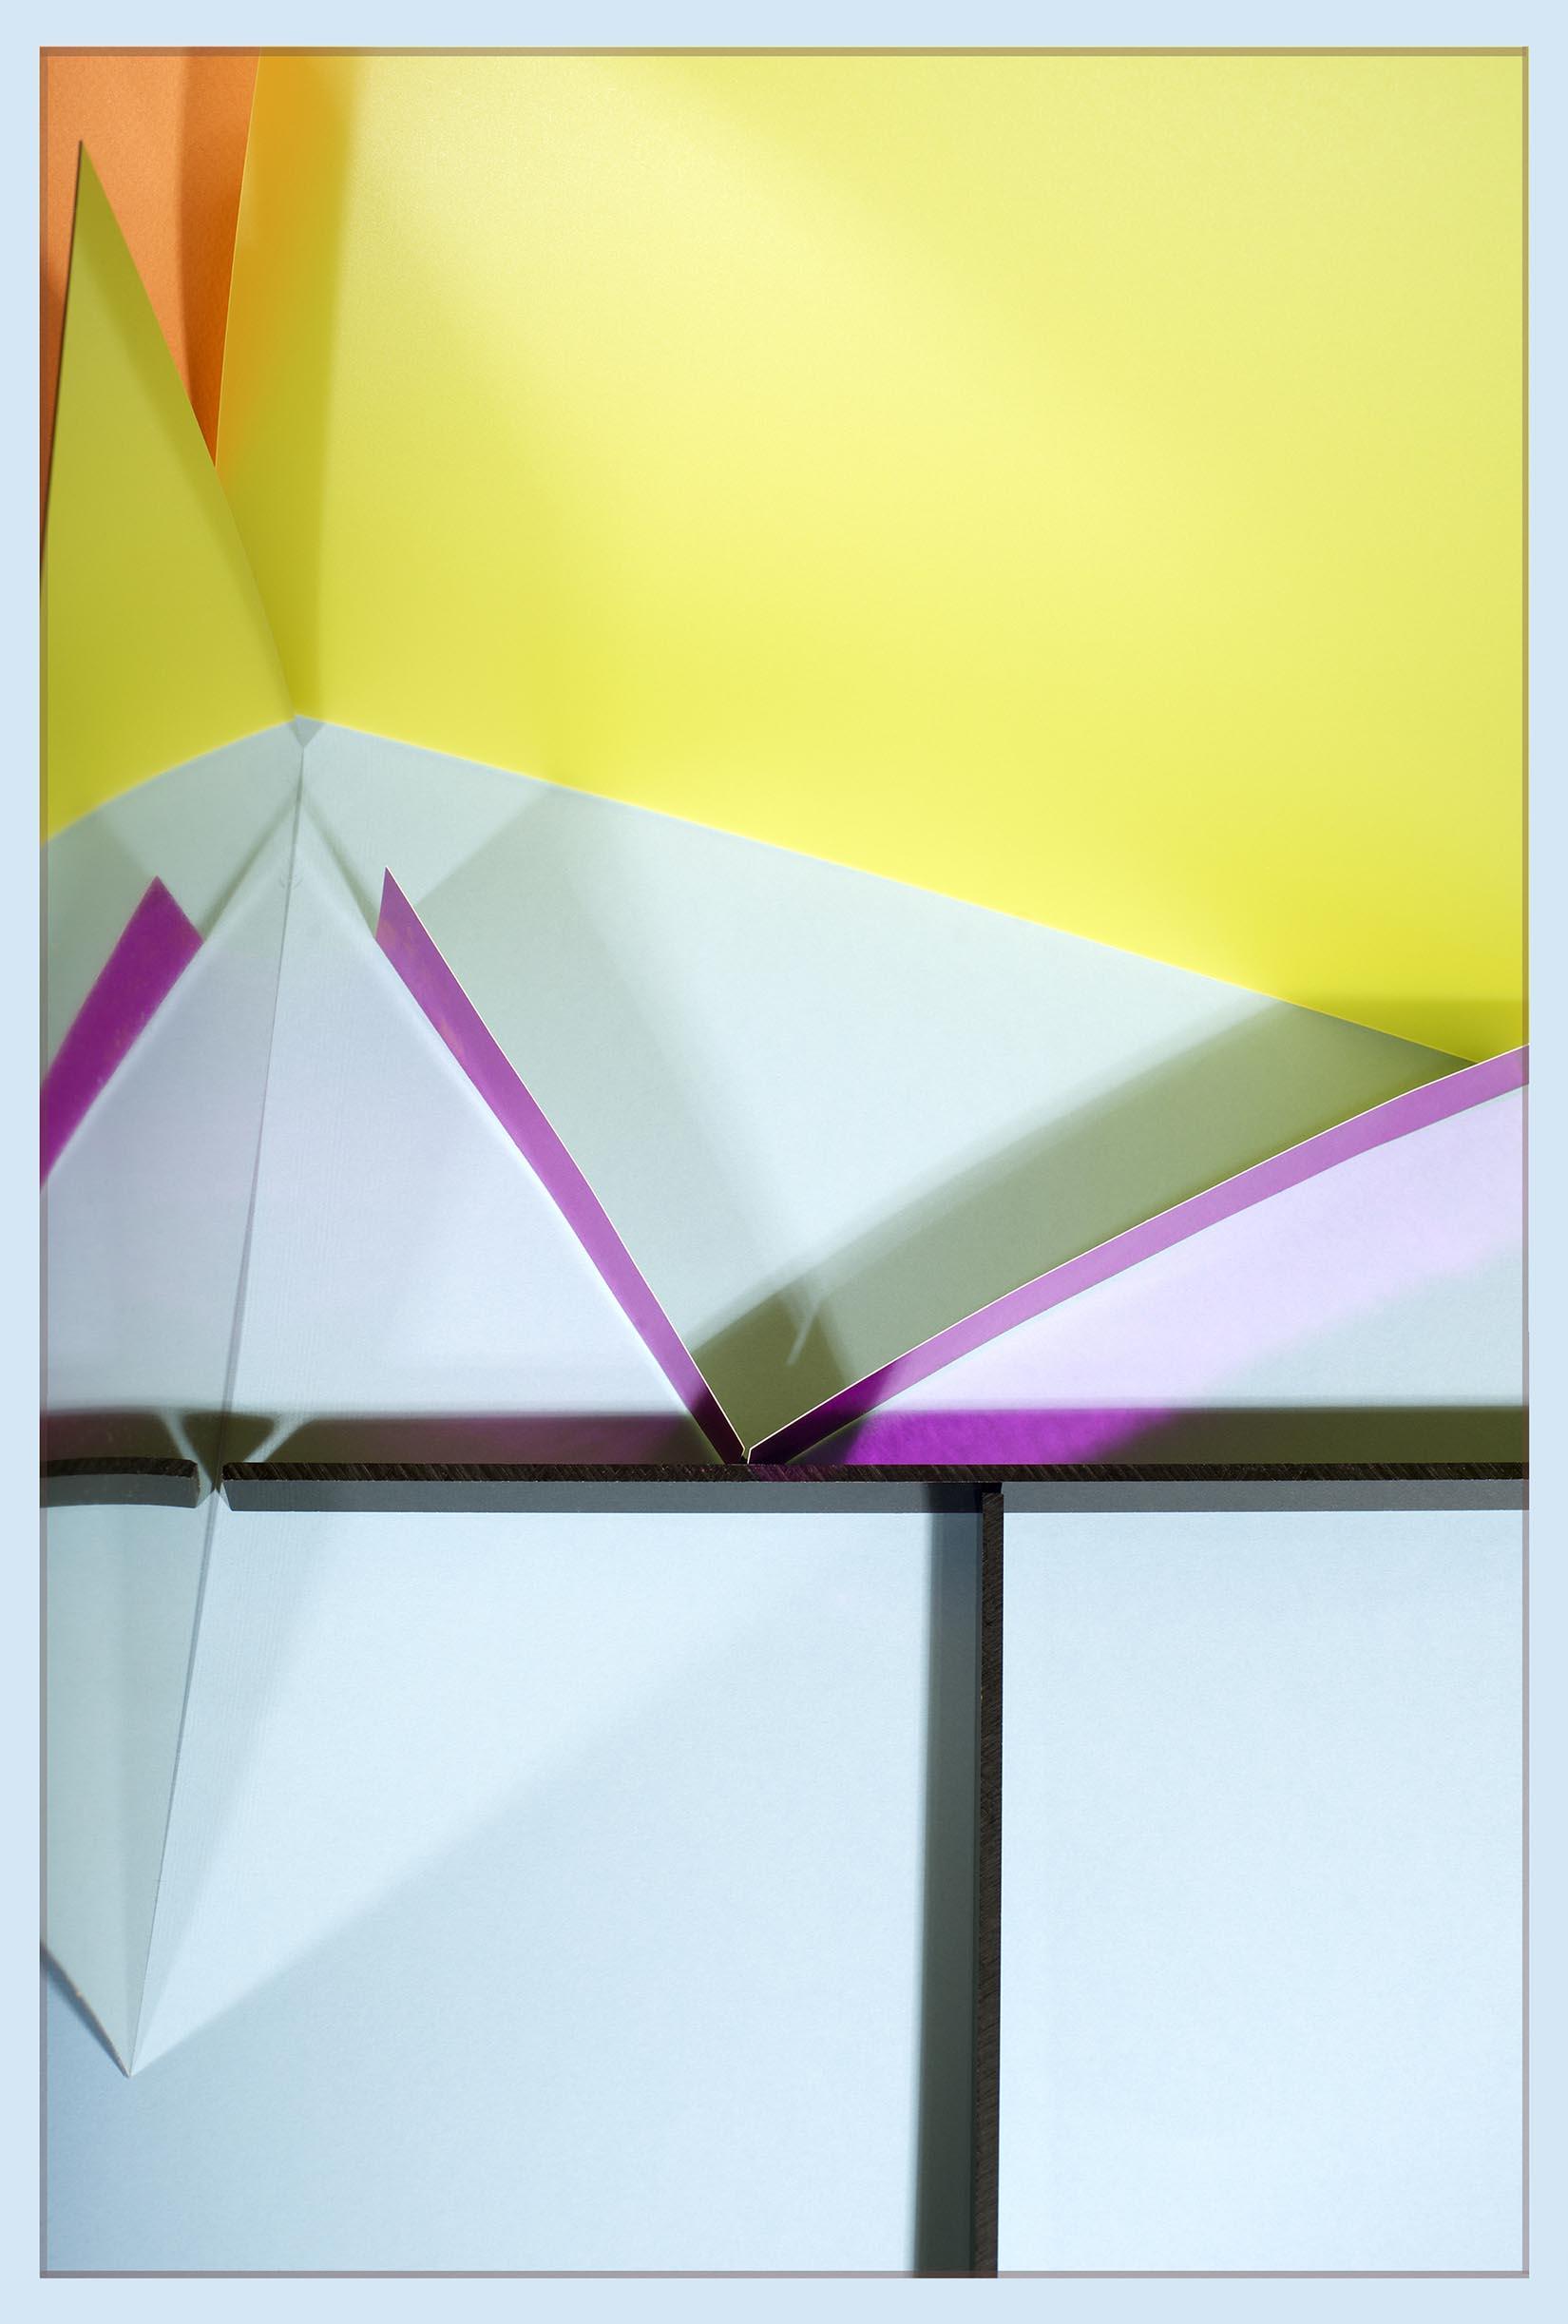 LYDIA WEGNER   Purple Point  2017 Archival inkjet print 80 x 53.5 cm